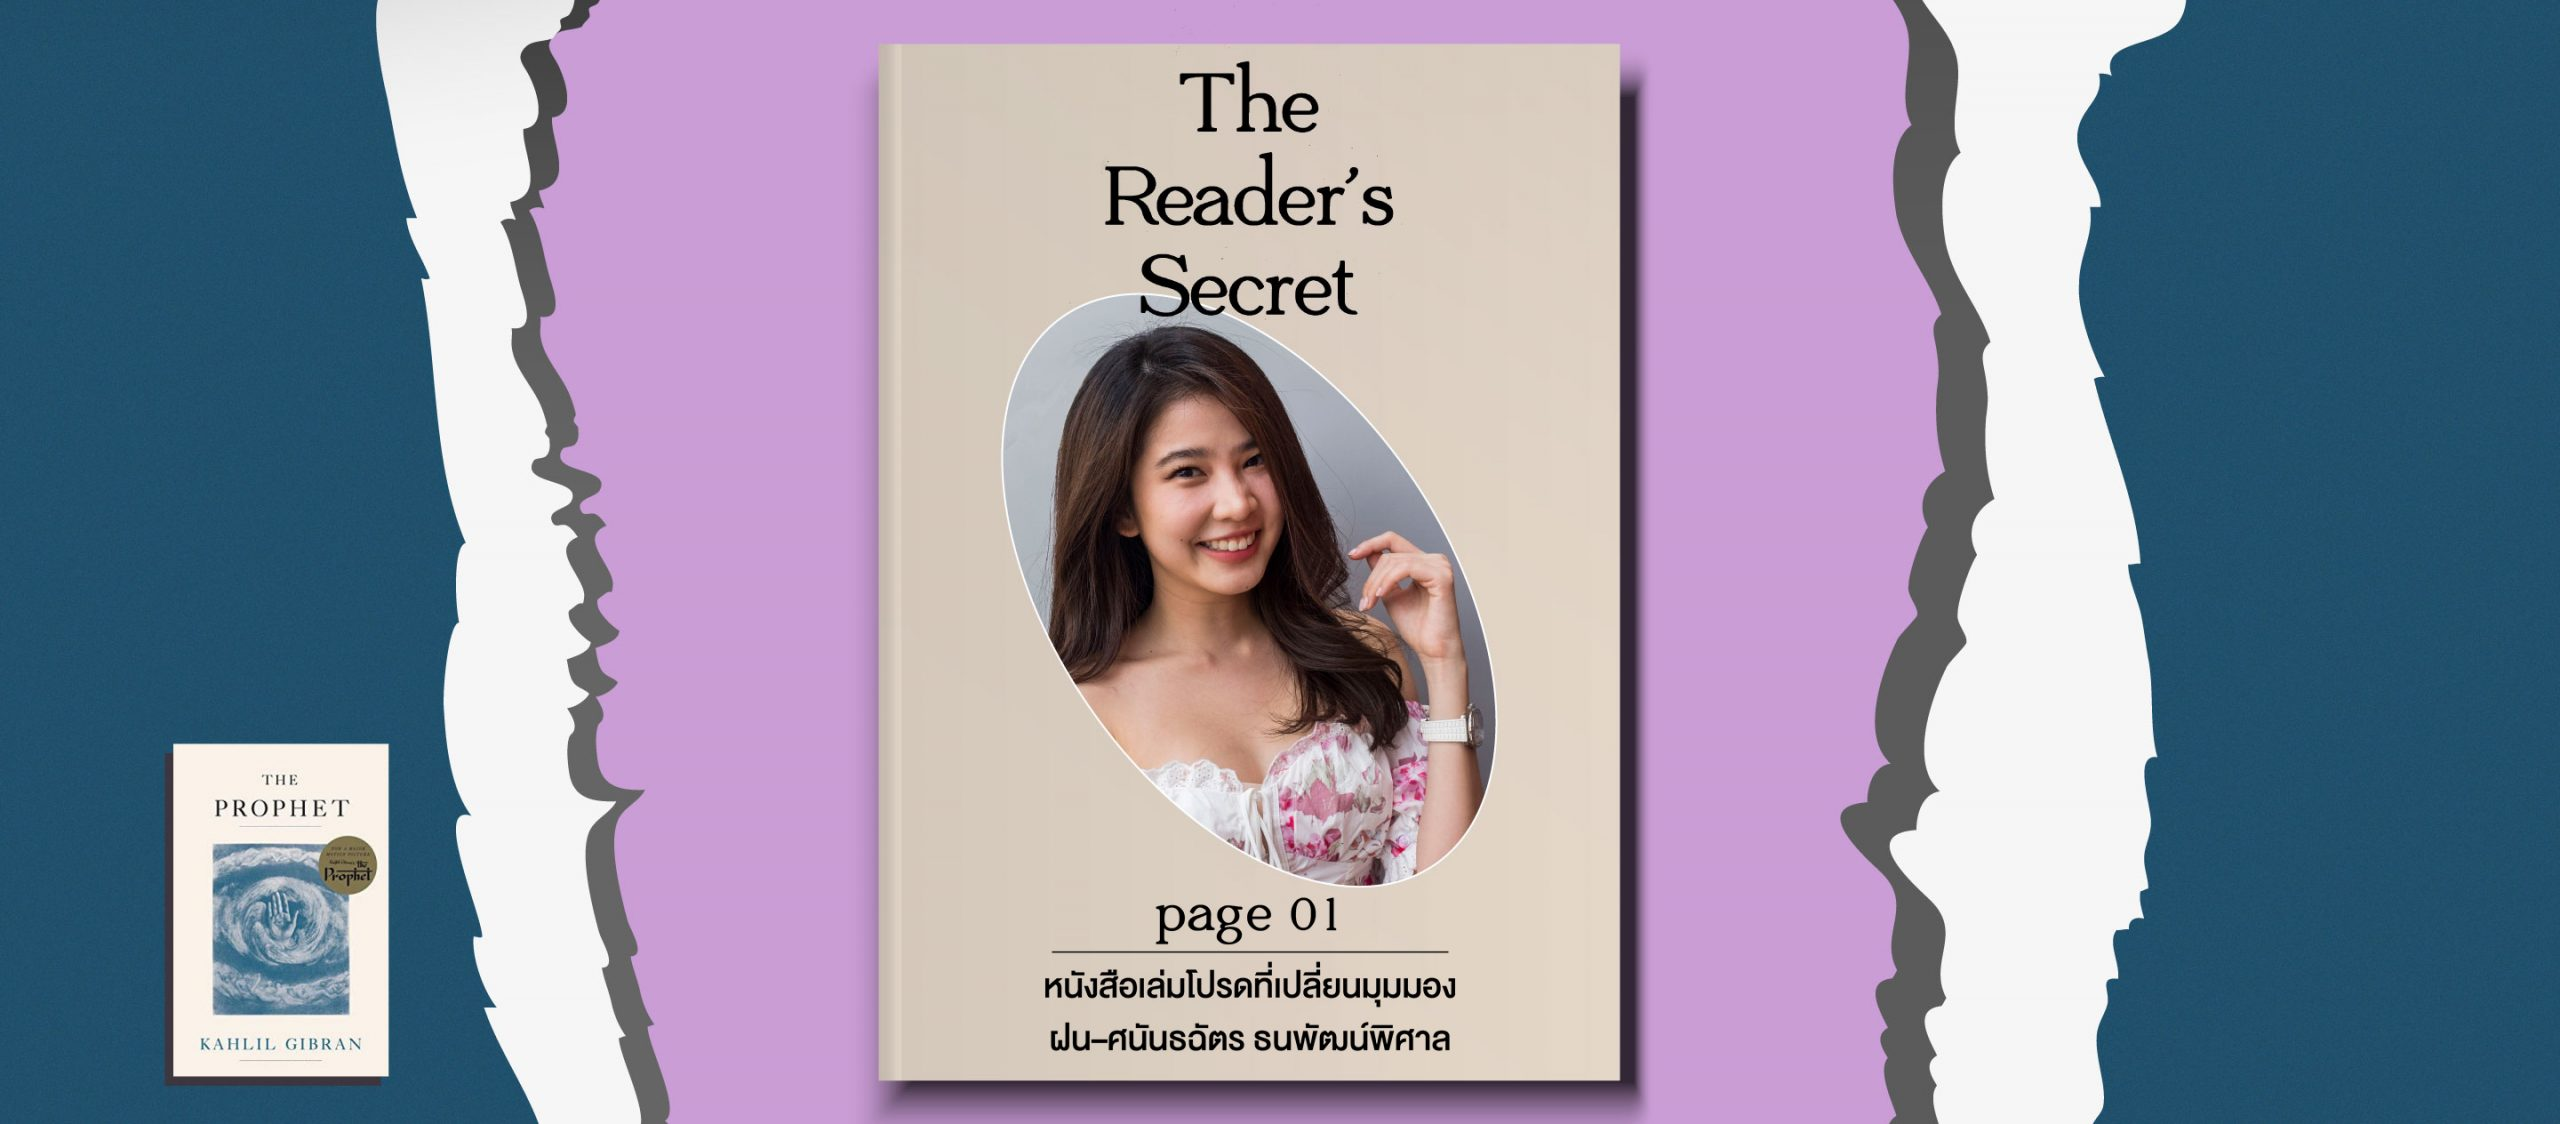 The Reader's Secret EP.01 หนังสือเล่มโปรดที่เปลี่ยนมุมมอง ฝน–ศนันธฉัตร ธนพัฒน์พิศาล